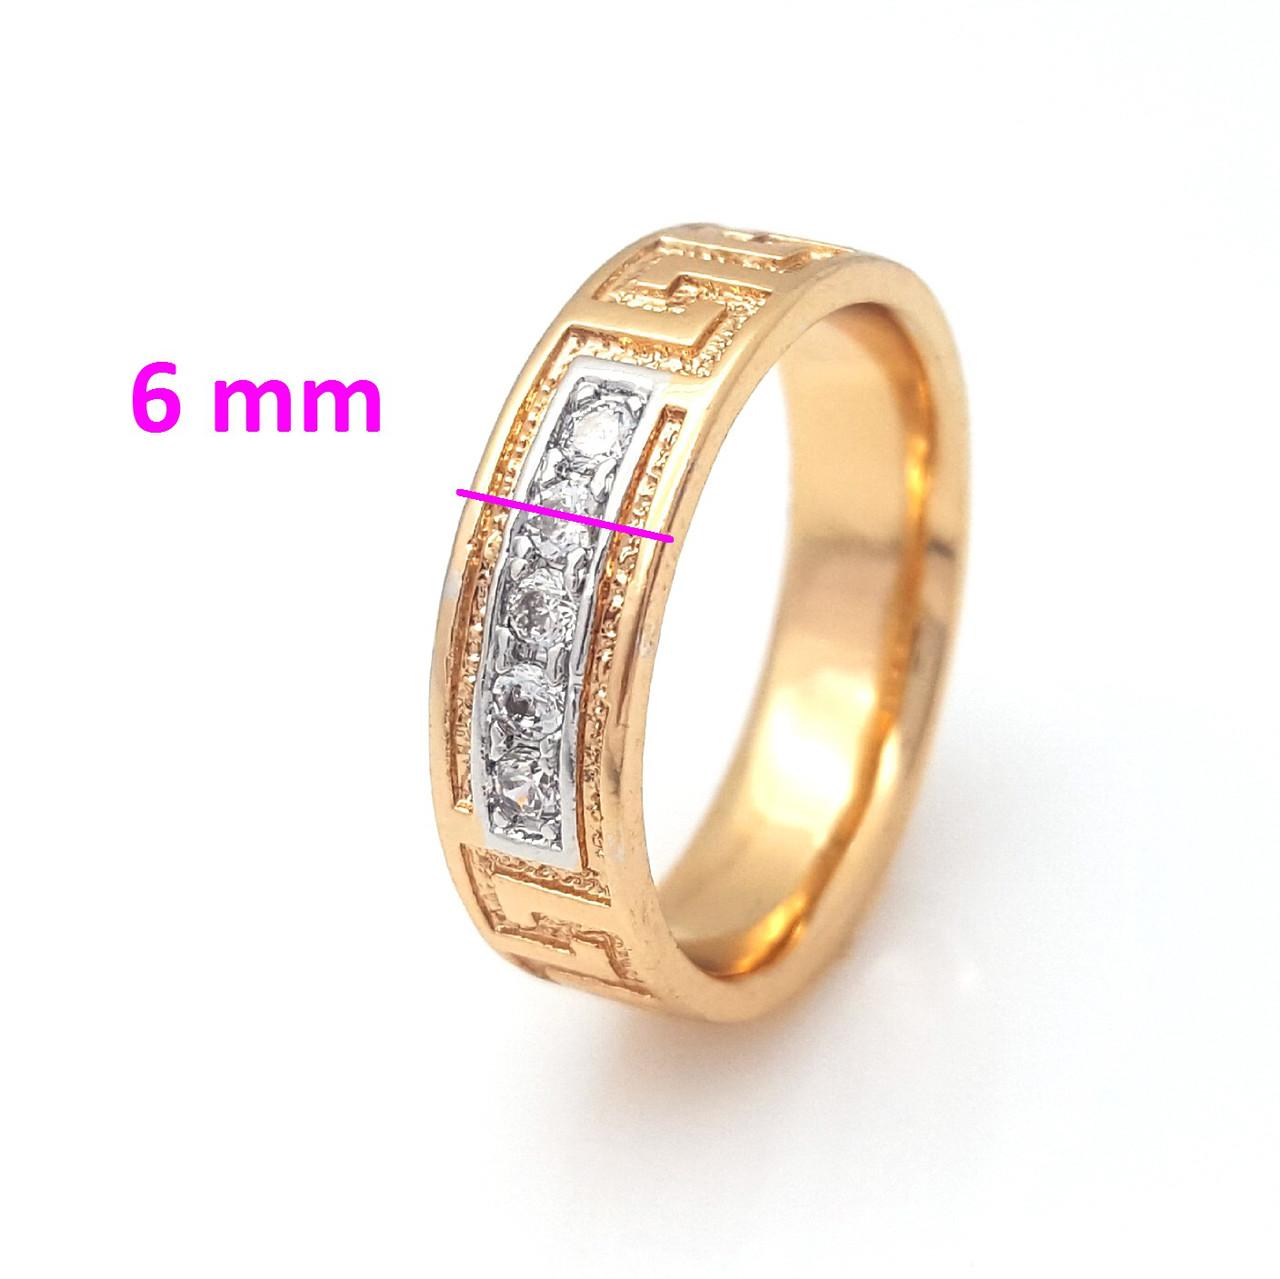 Кольцо с Греческим узором, инкрустация камнями, р.16,5, р.17, р.18, р.19 позолота+родий